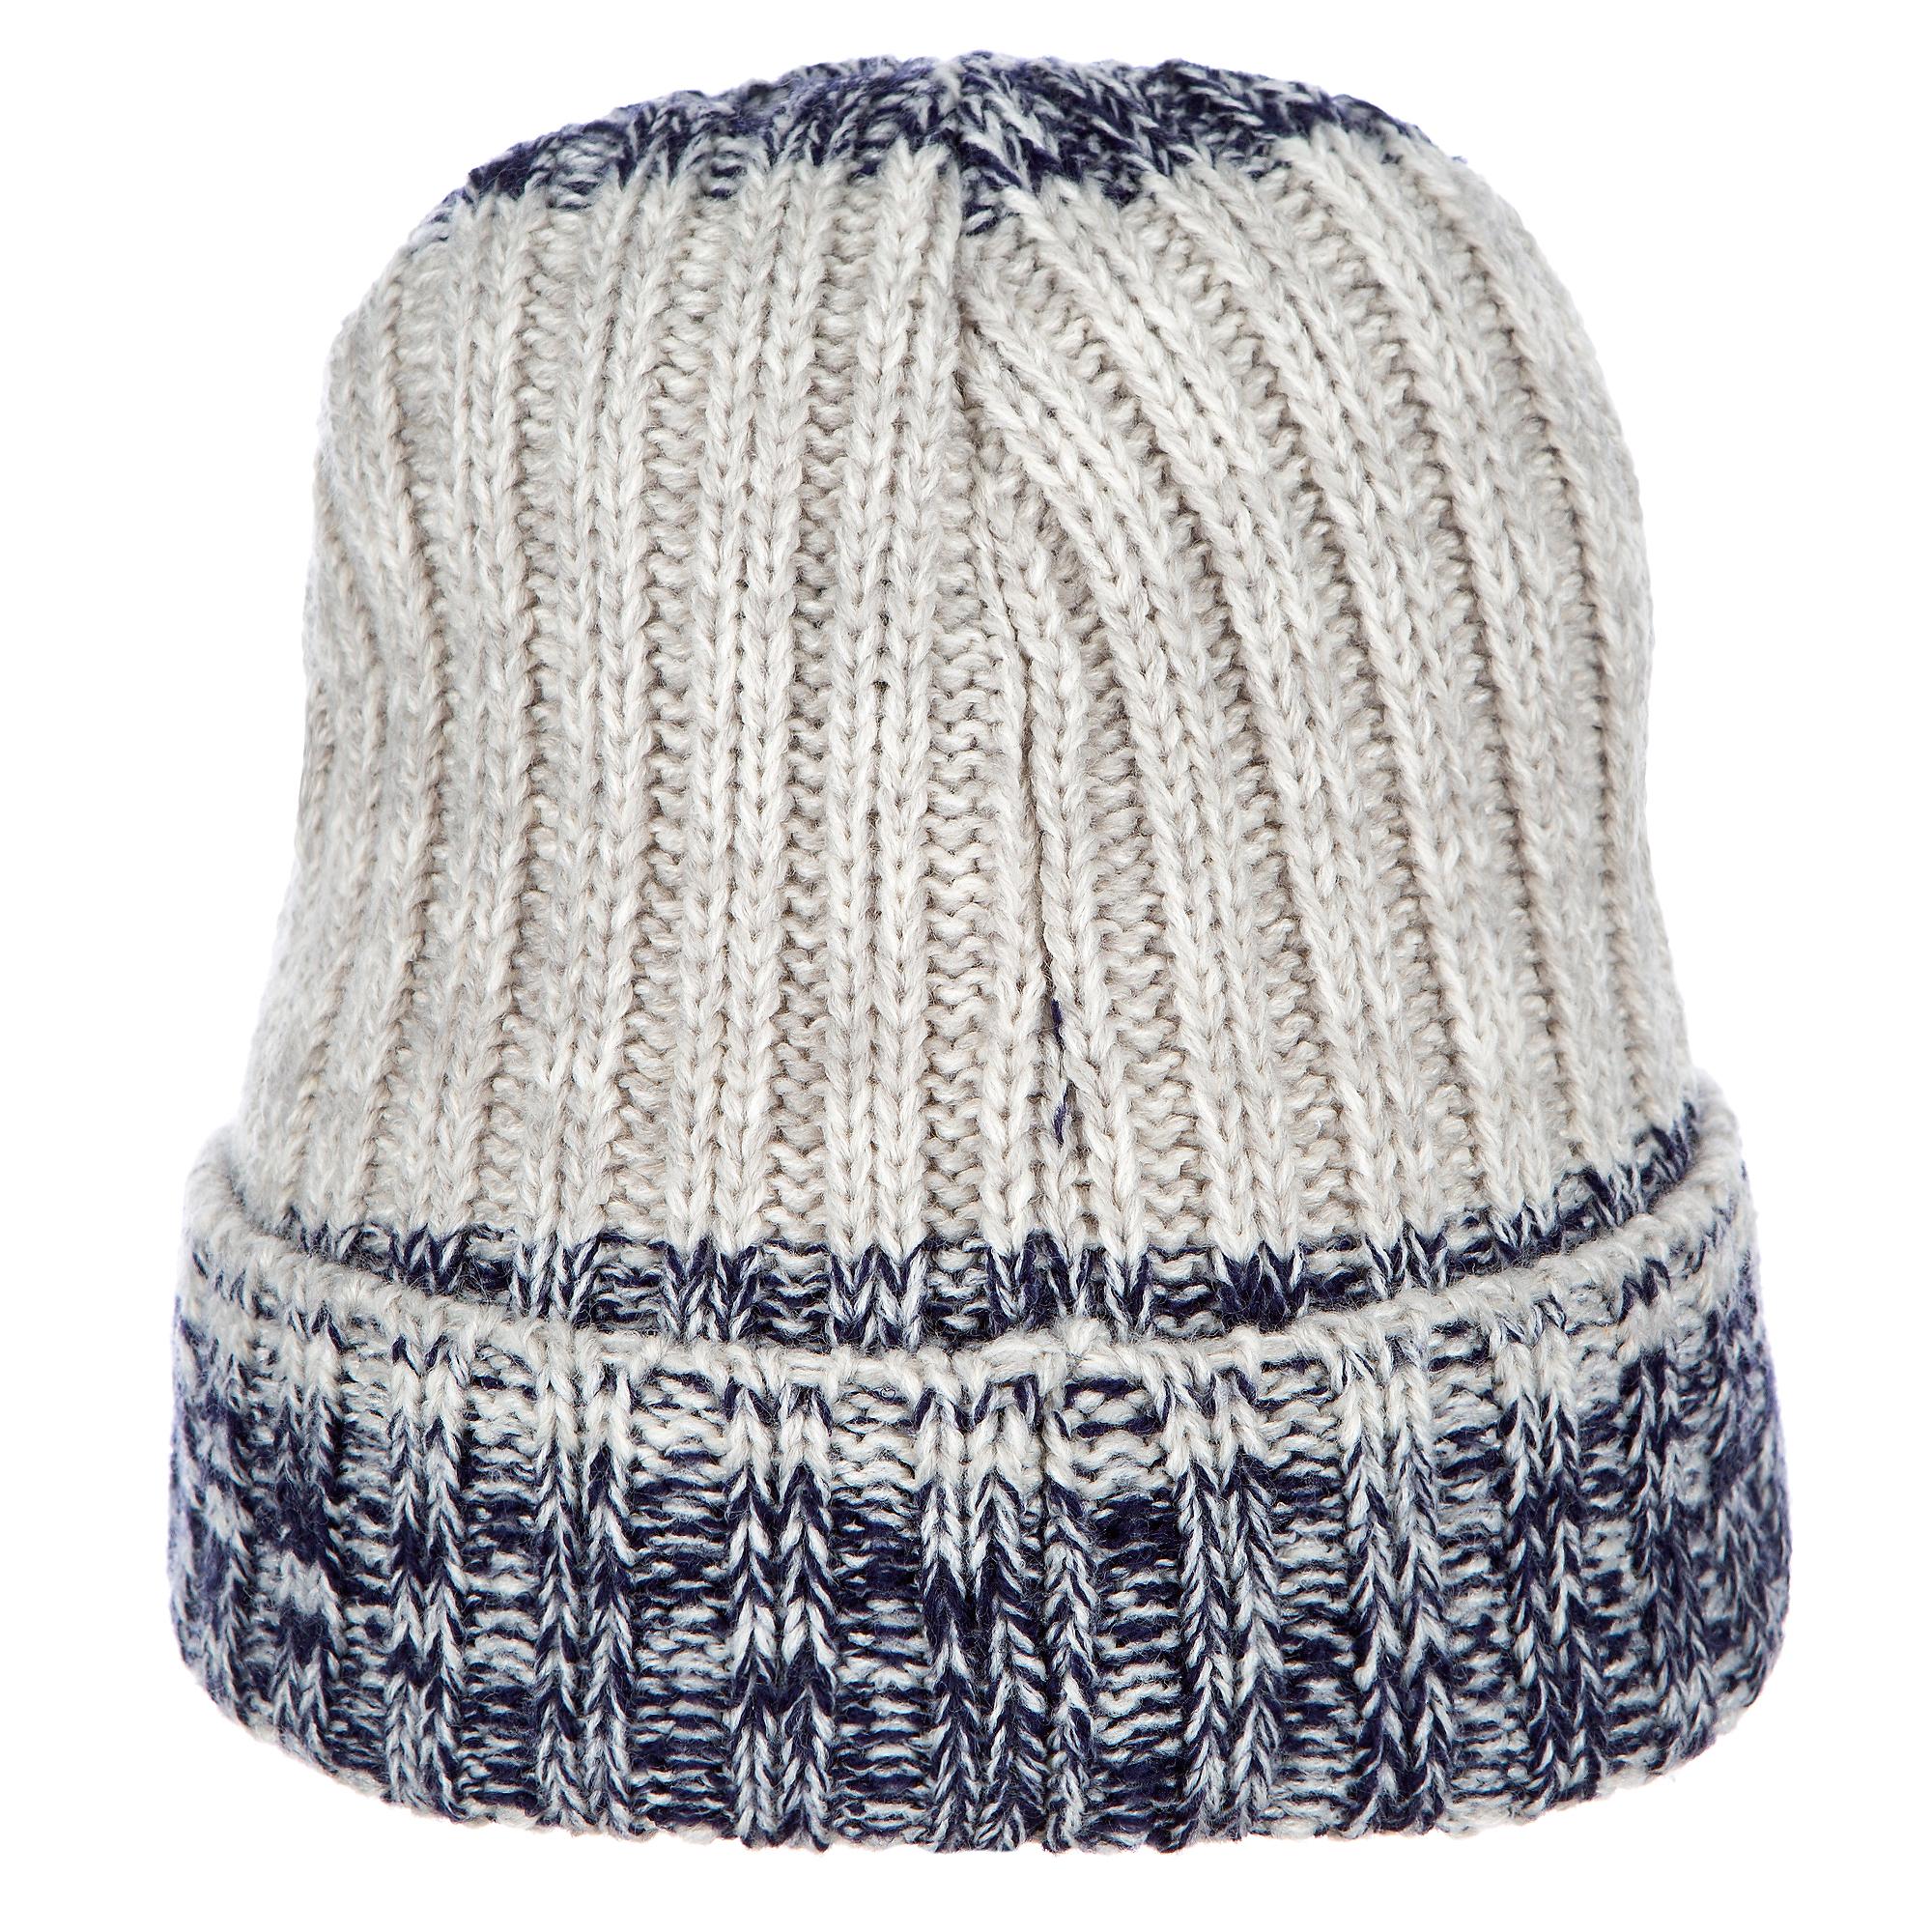 c04272f28 Dallas Cowboys Youth Slater Knit Hat ...